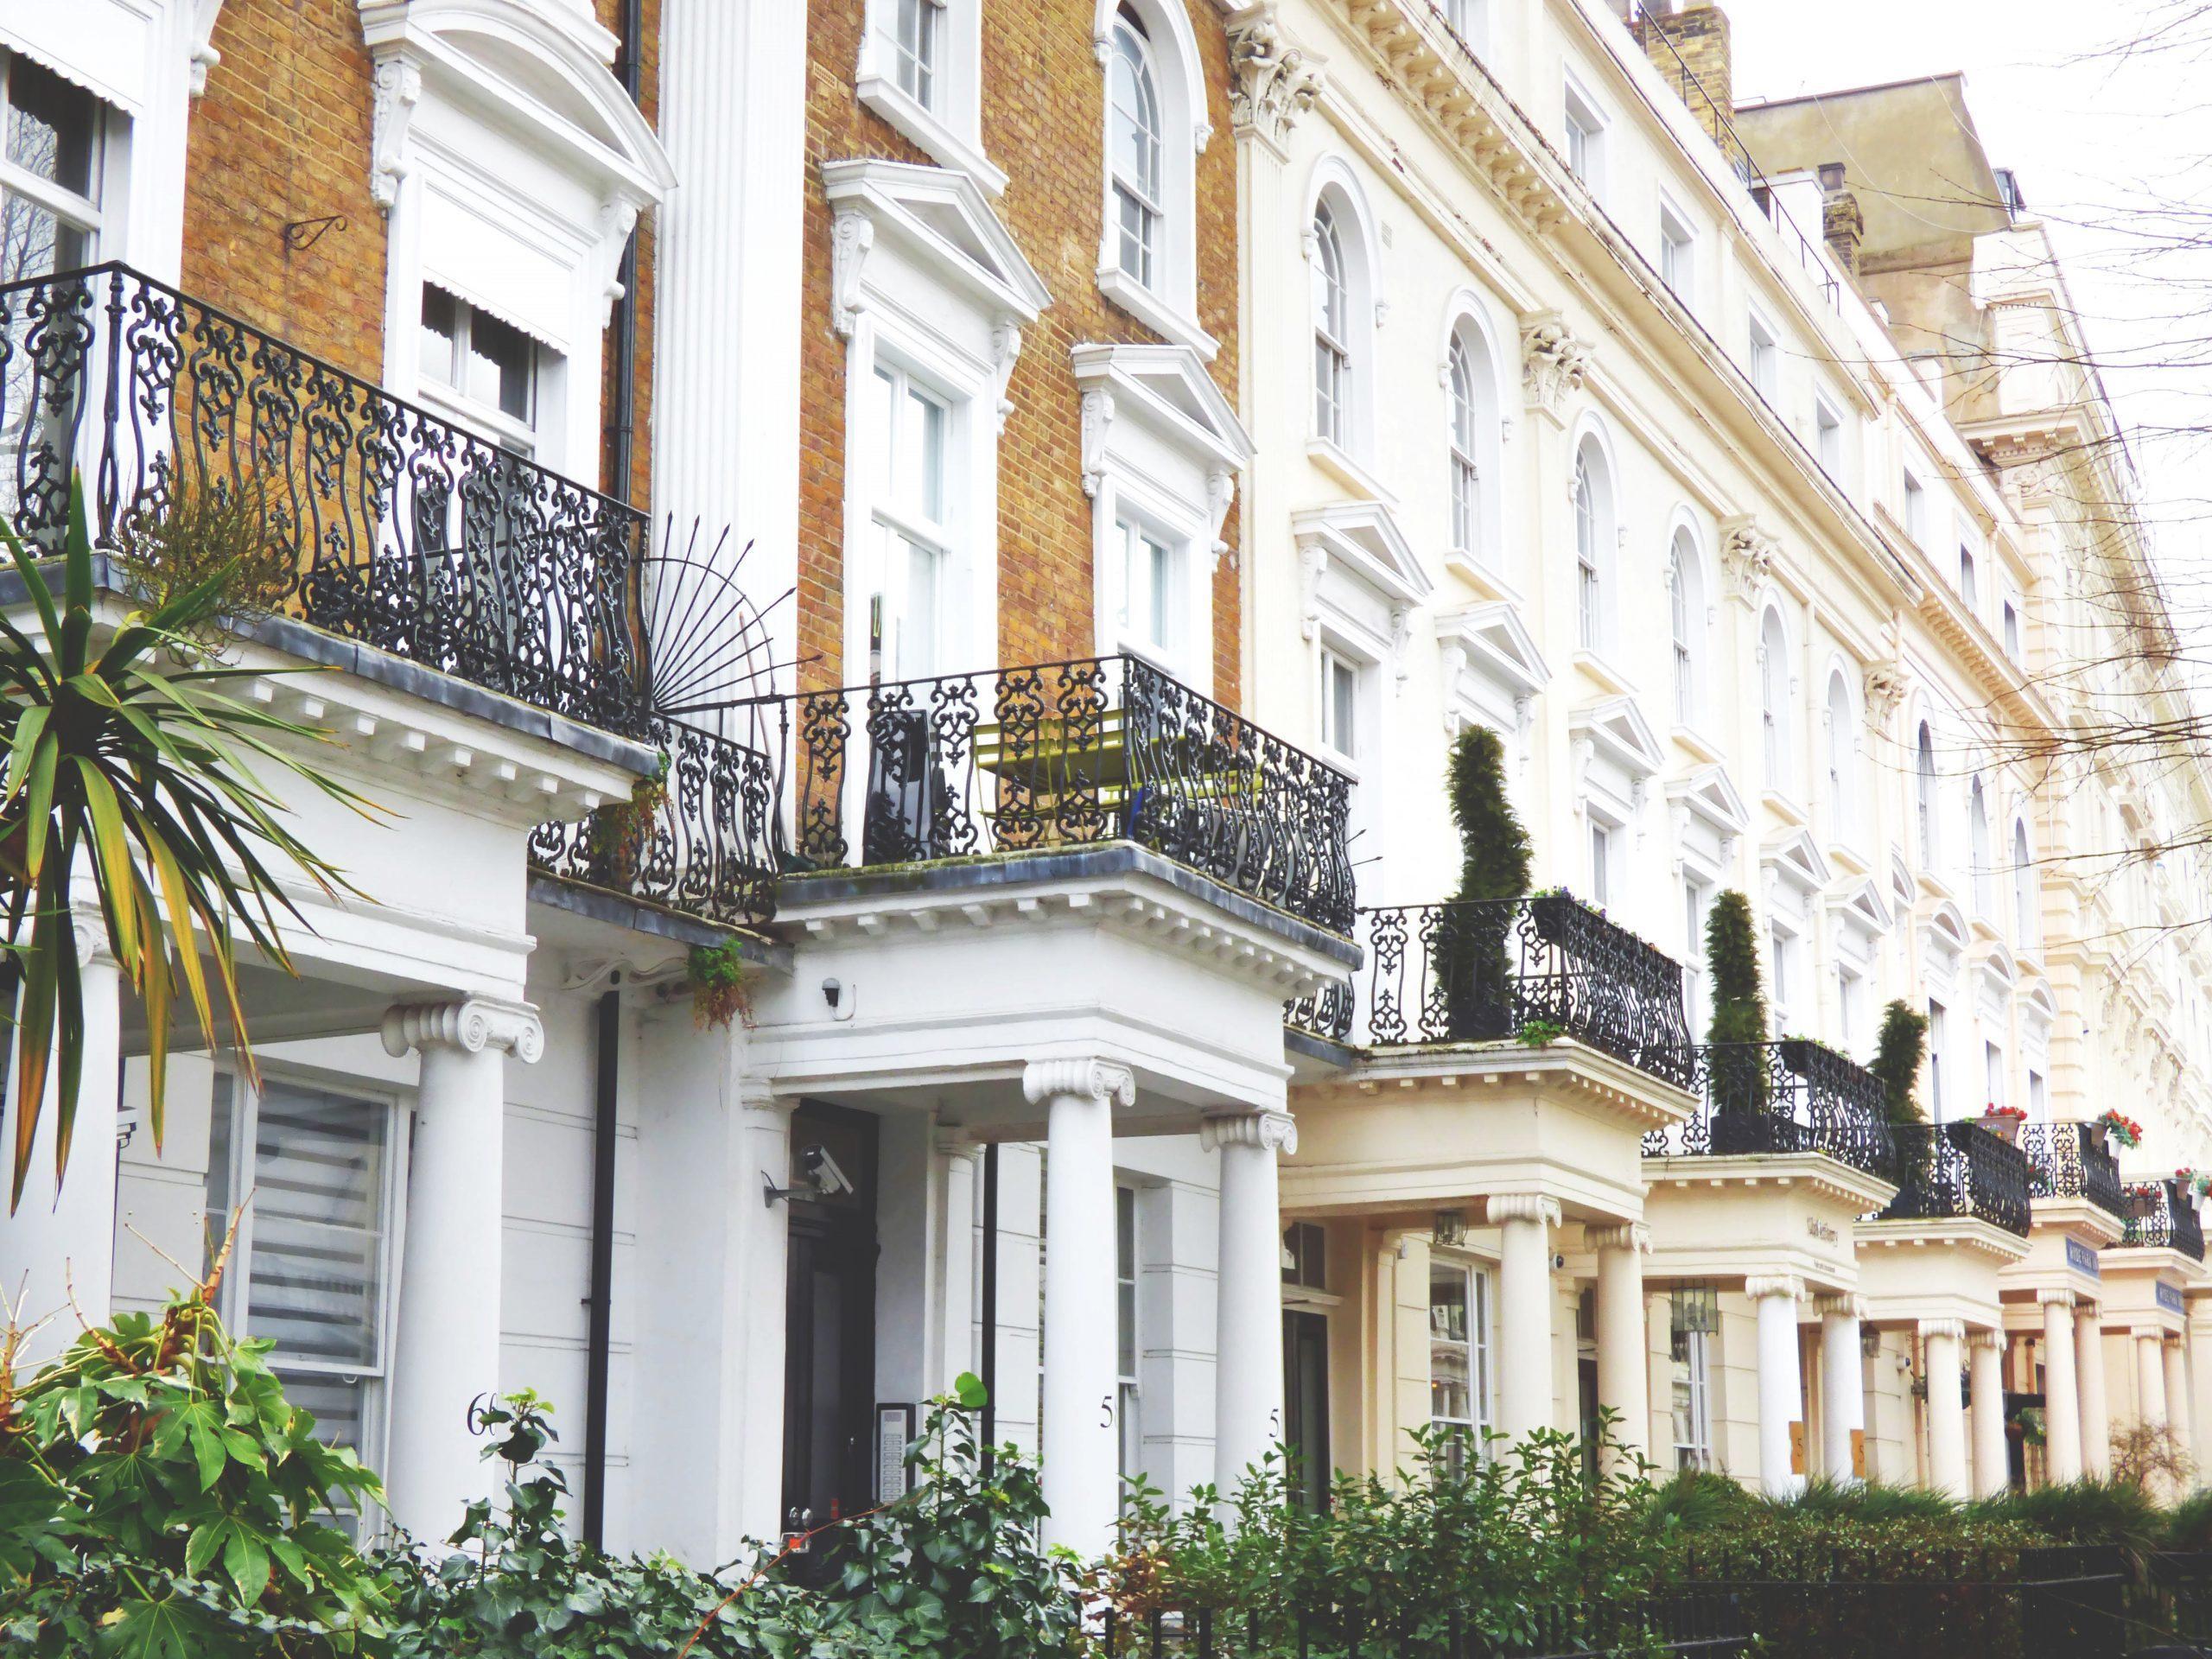 Estates like these require smart, informal estate planning via non-probate property